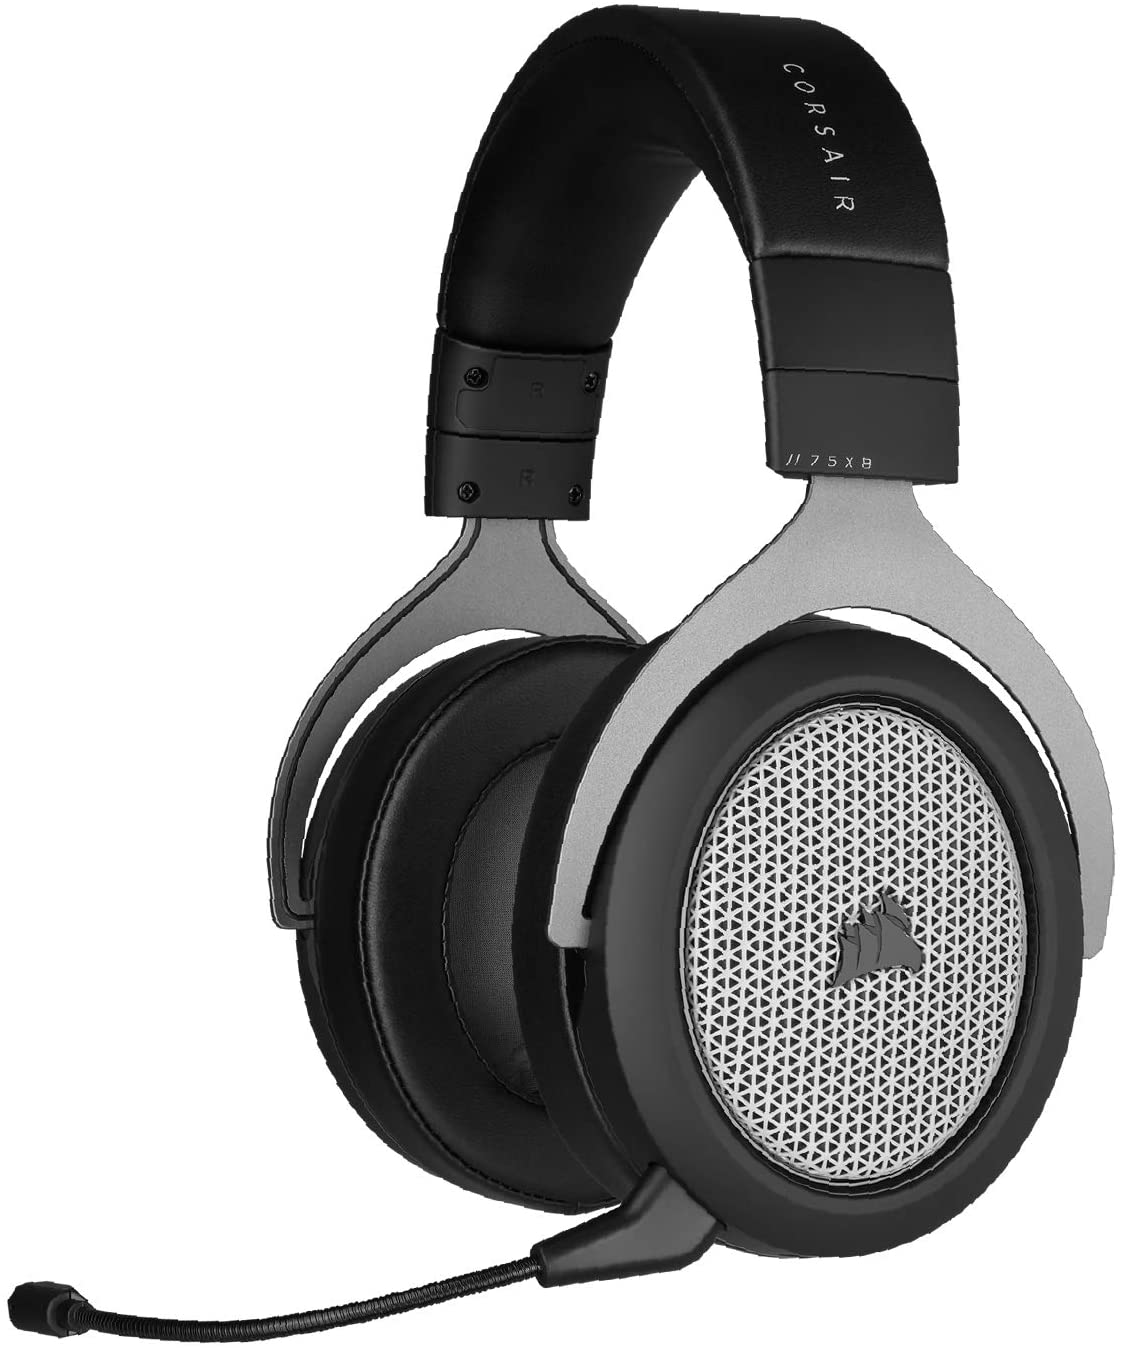 Auriculares Corsair HS75 XB Wireless